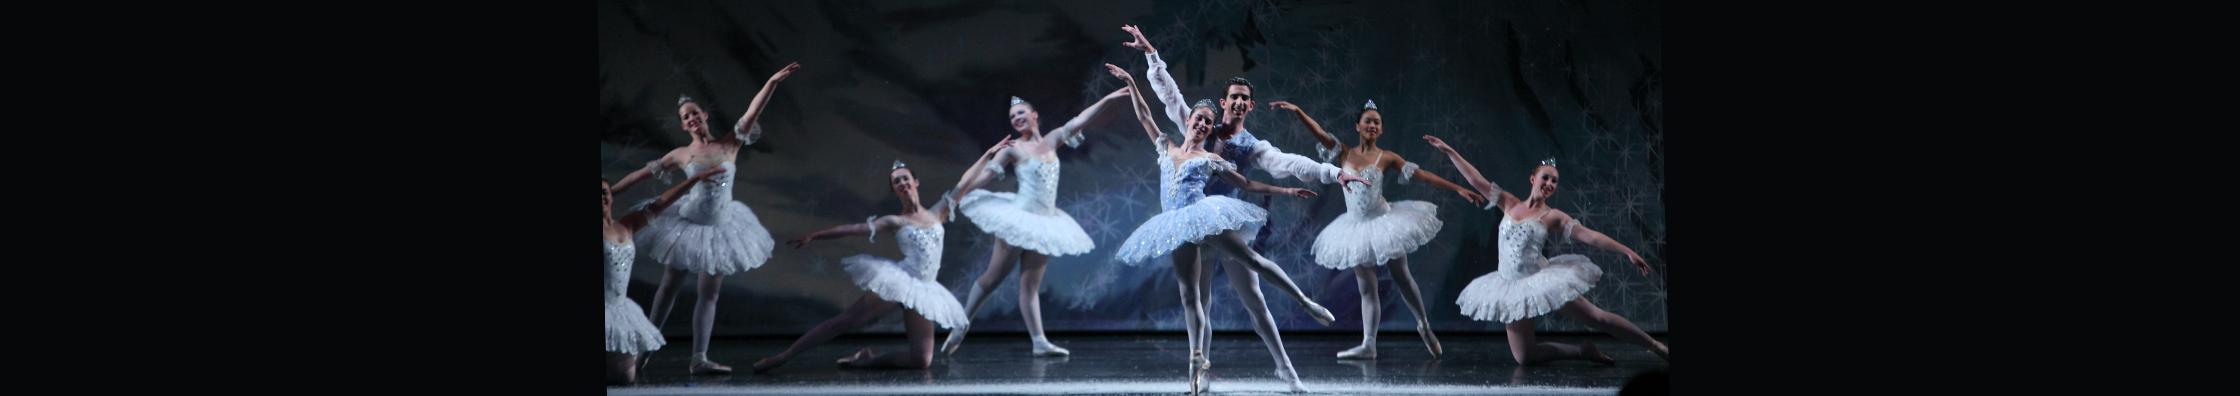 State street Arlington Theatre Nutcracker Santa Barbara Festival Ballet Tradition19